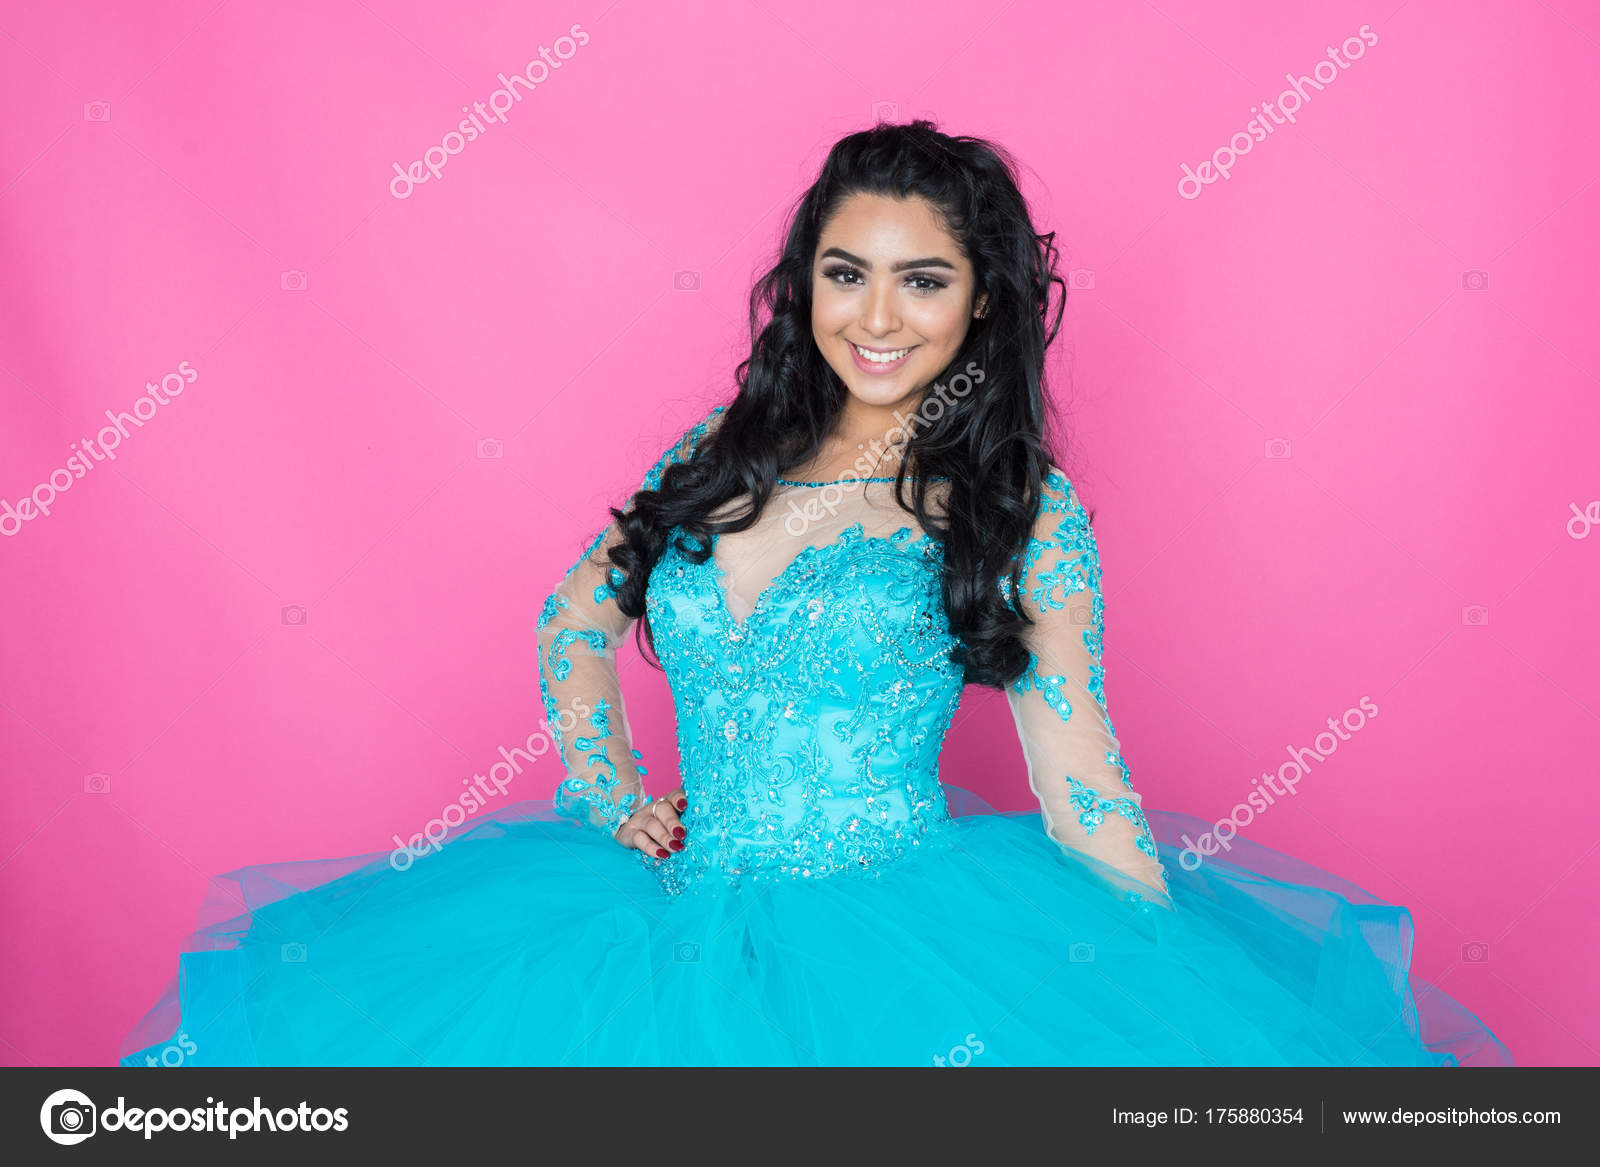 Teen en vestido de fiesta — Foto de stock © rmarmion #175880354